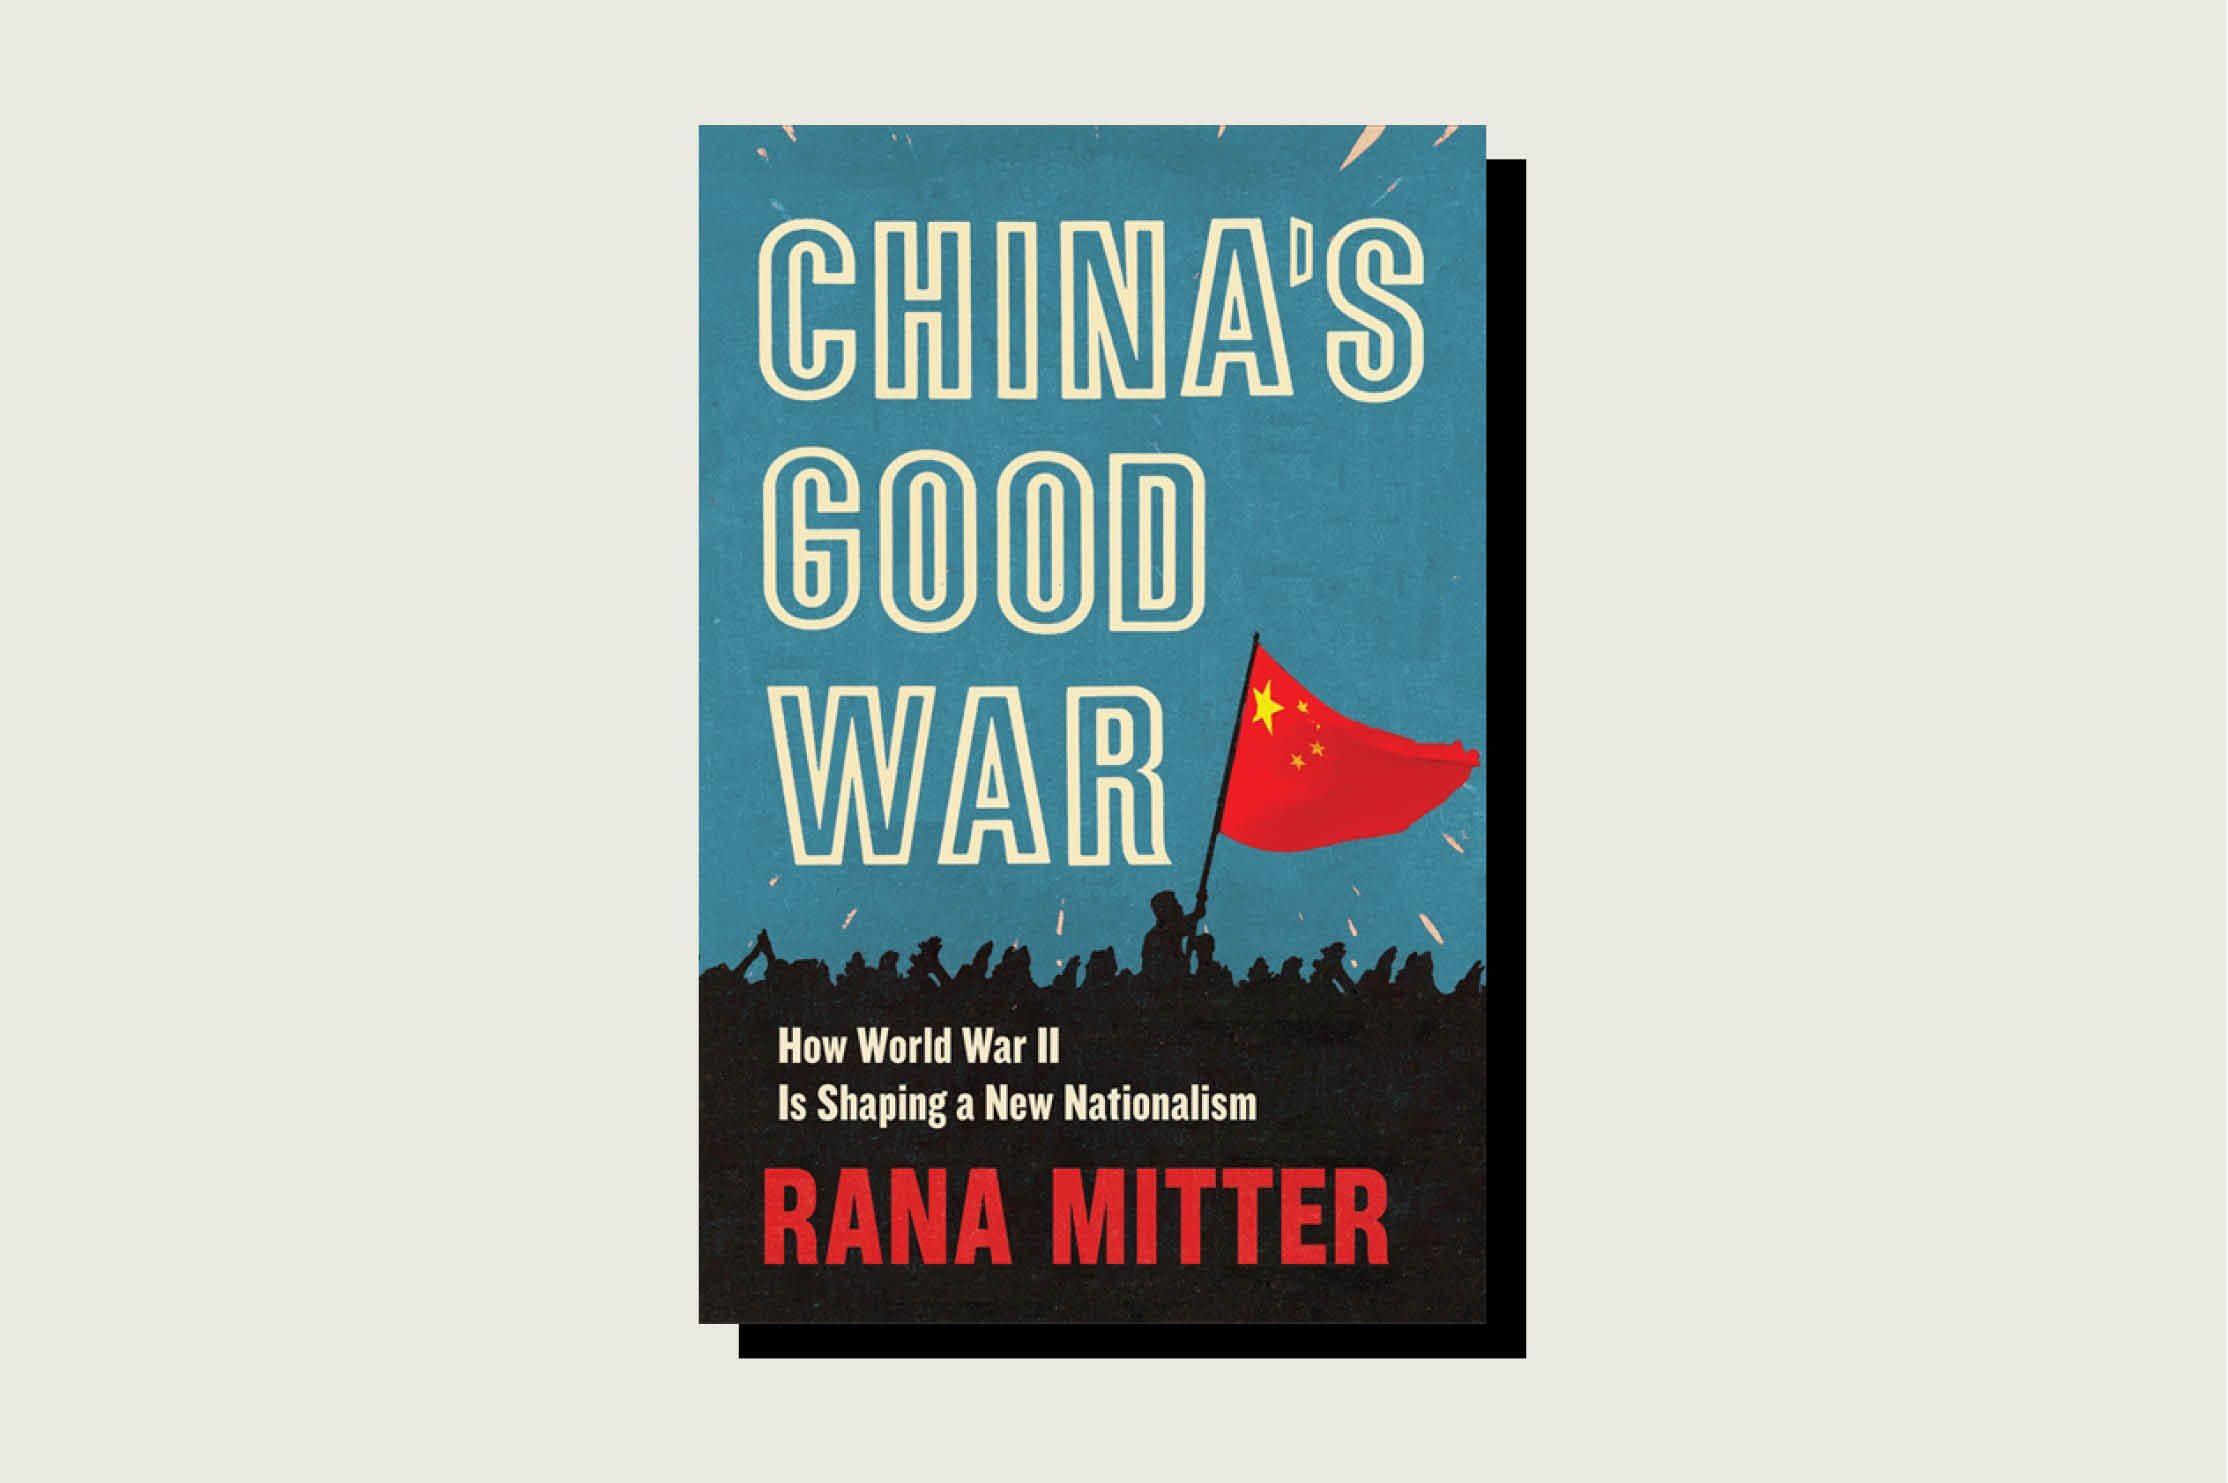 China's Good War: How World War II Is Shaping a New Nationalism, Rana Mitter, Harvard University Press, .95, September 2020